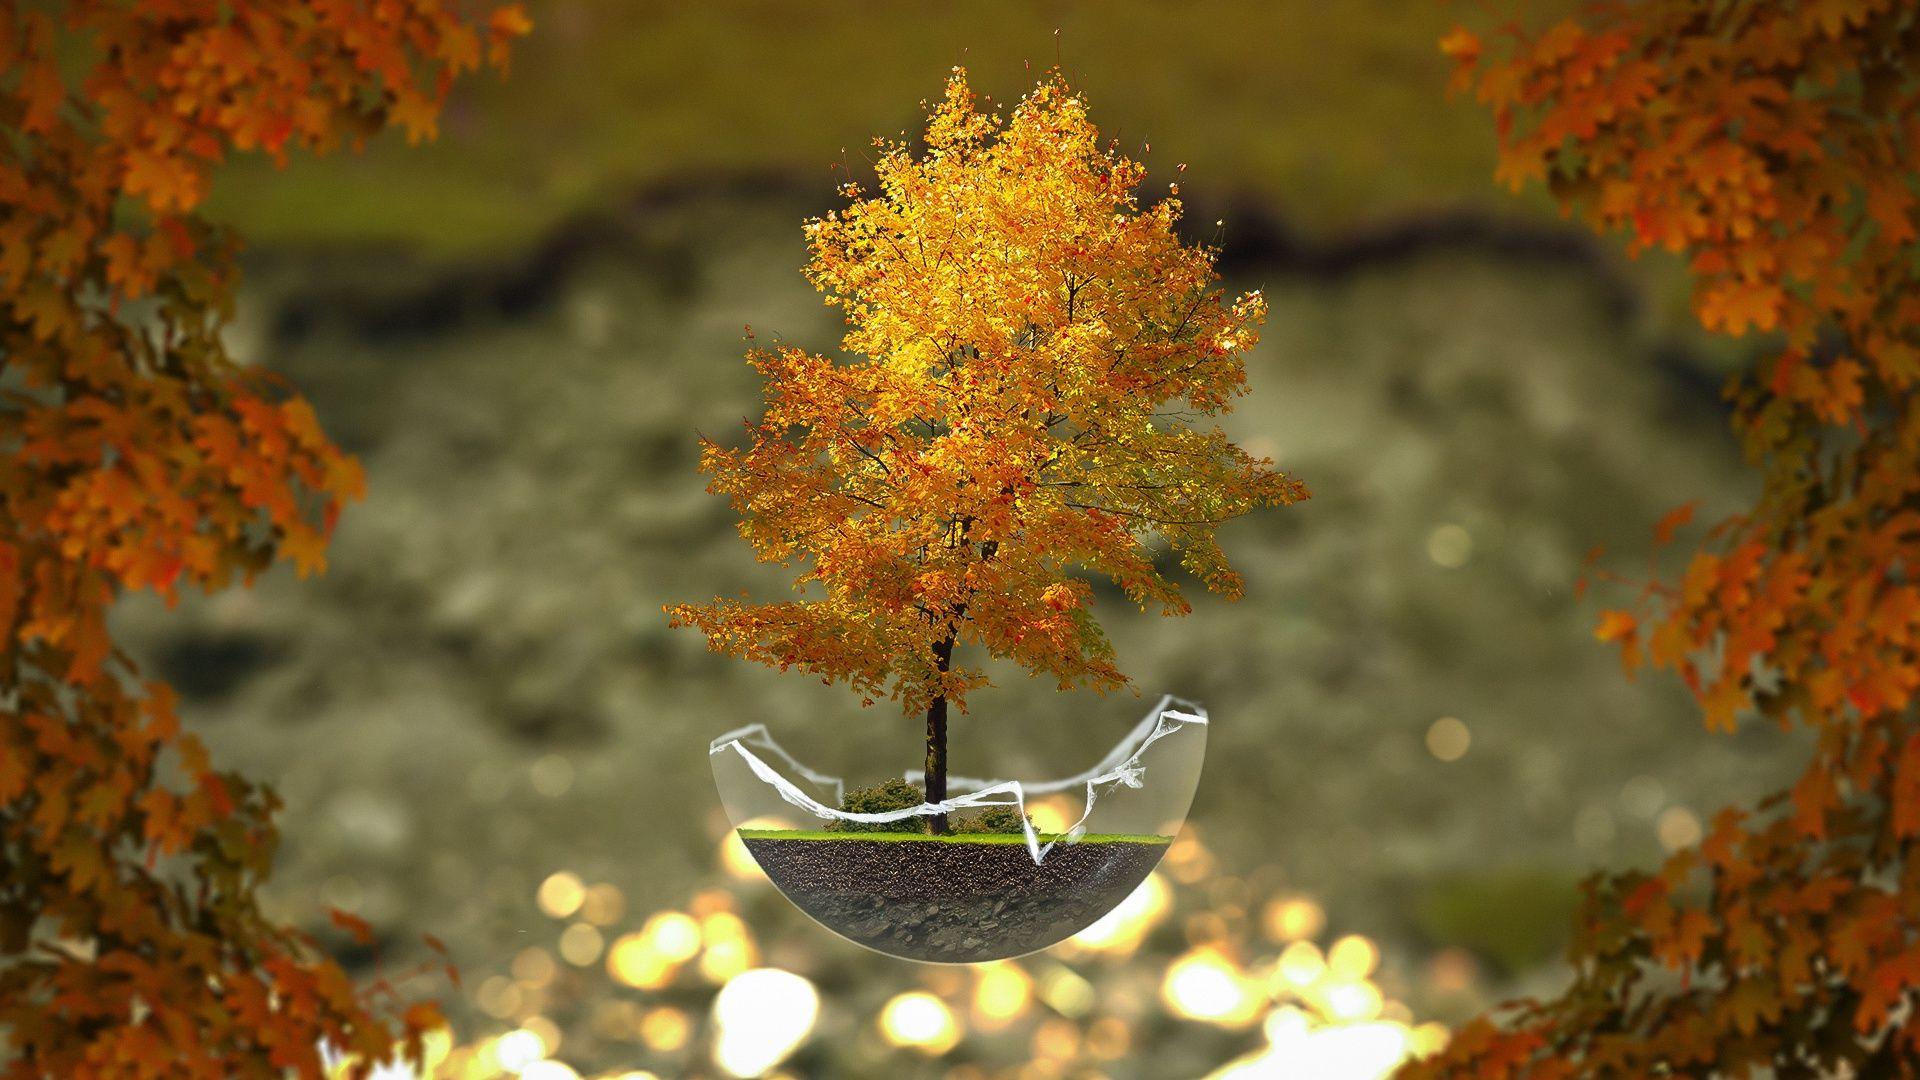 The Desktop Wallpaper Autumn, Tree, Bonsai